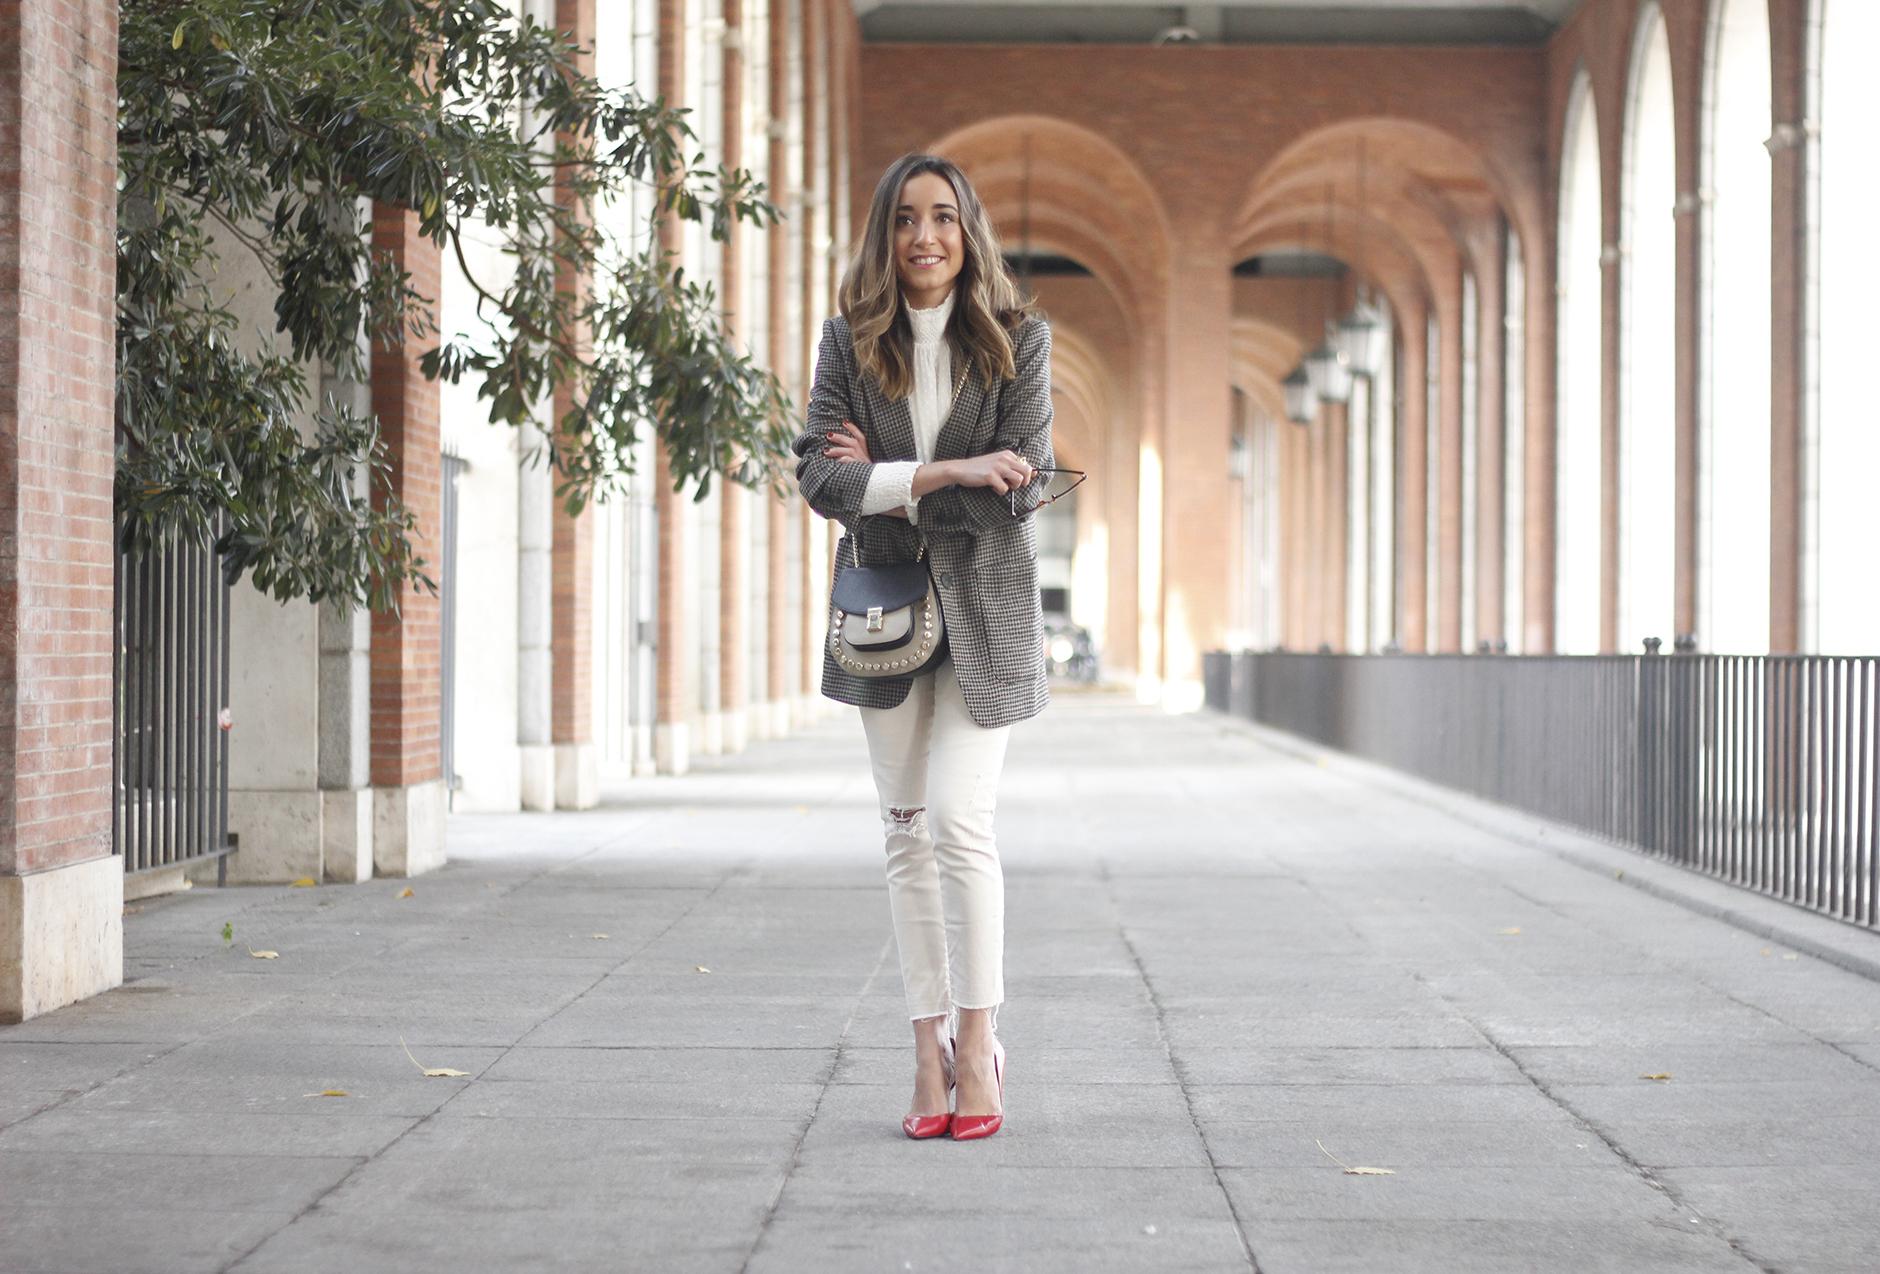 Plumeti blouse houndstooth blazer white jeans outfit style streetstyle18